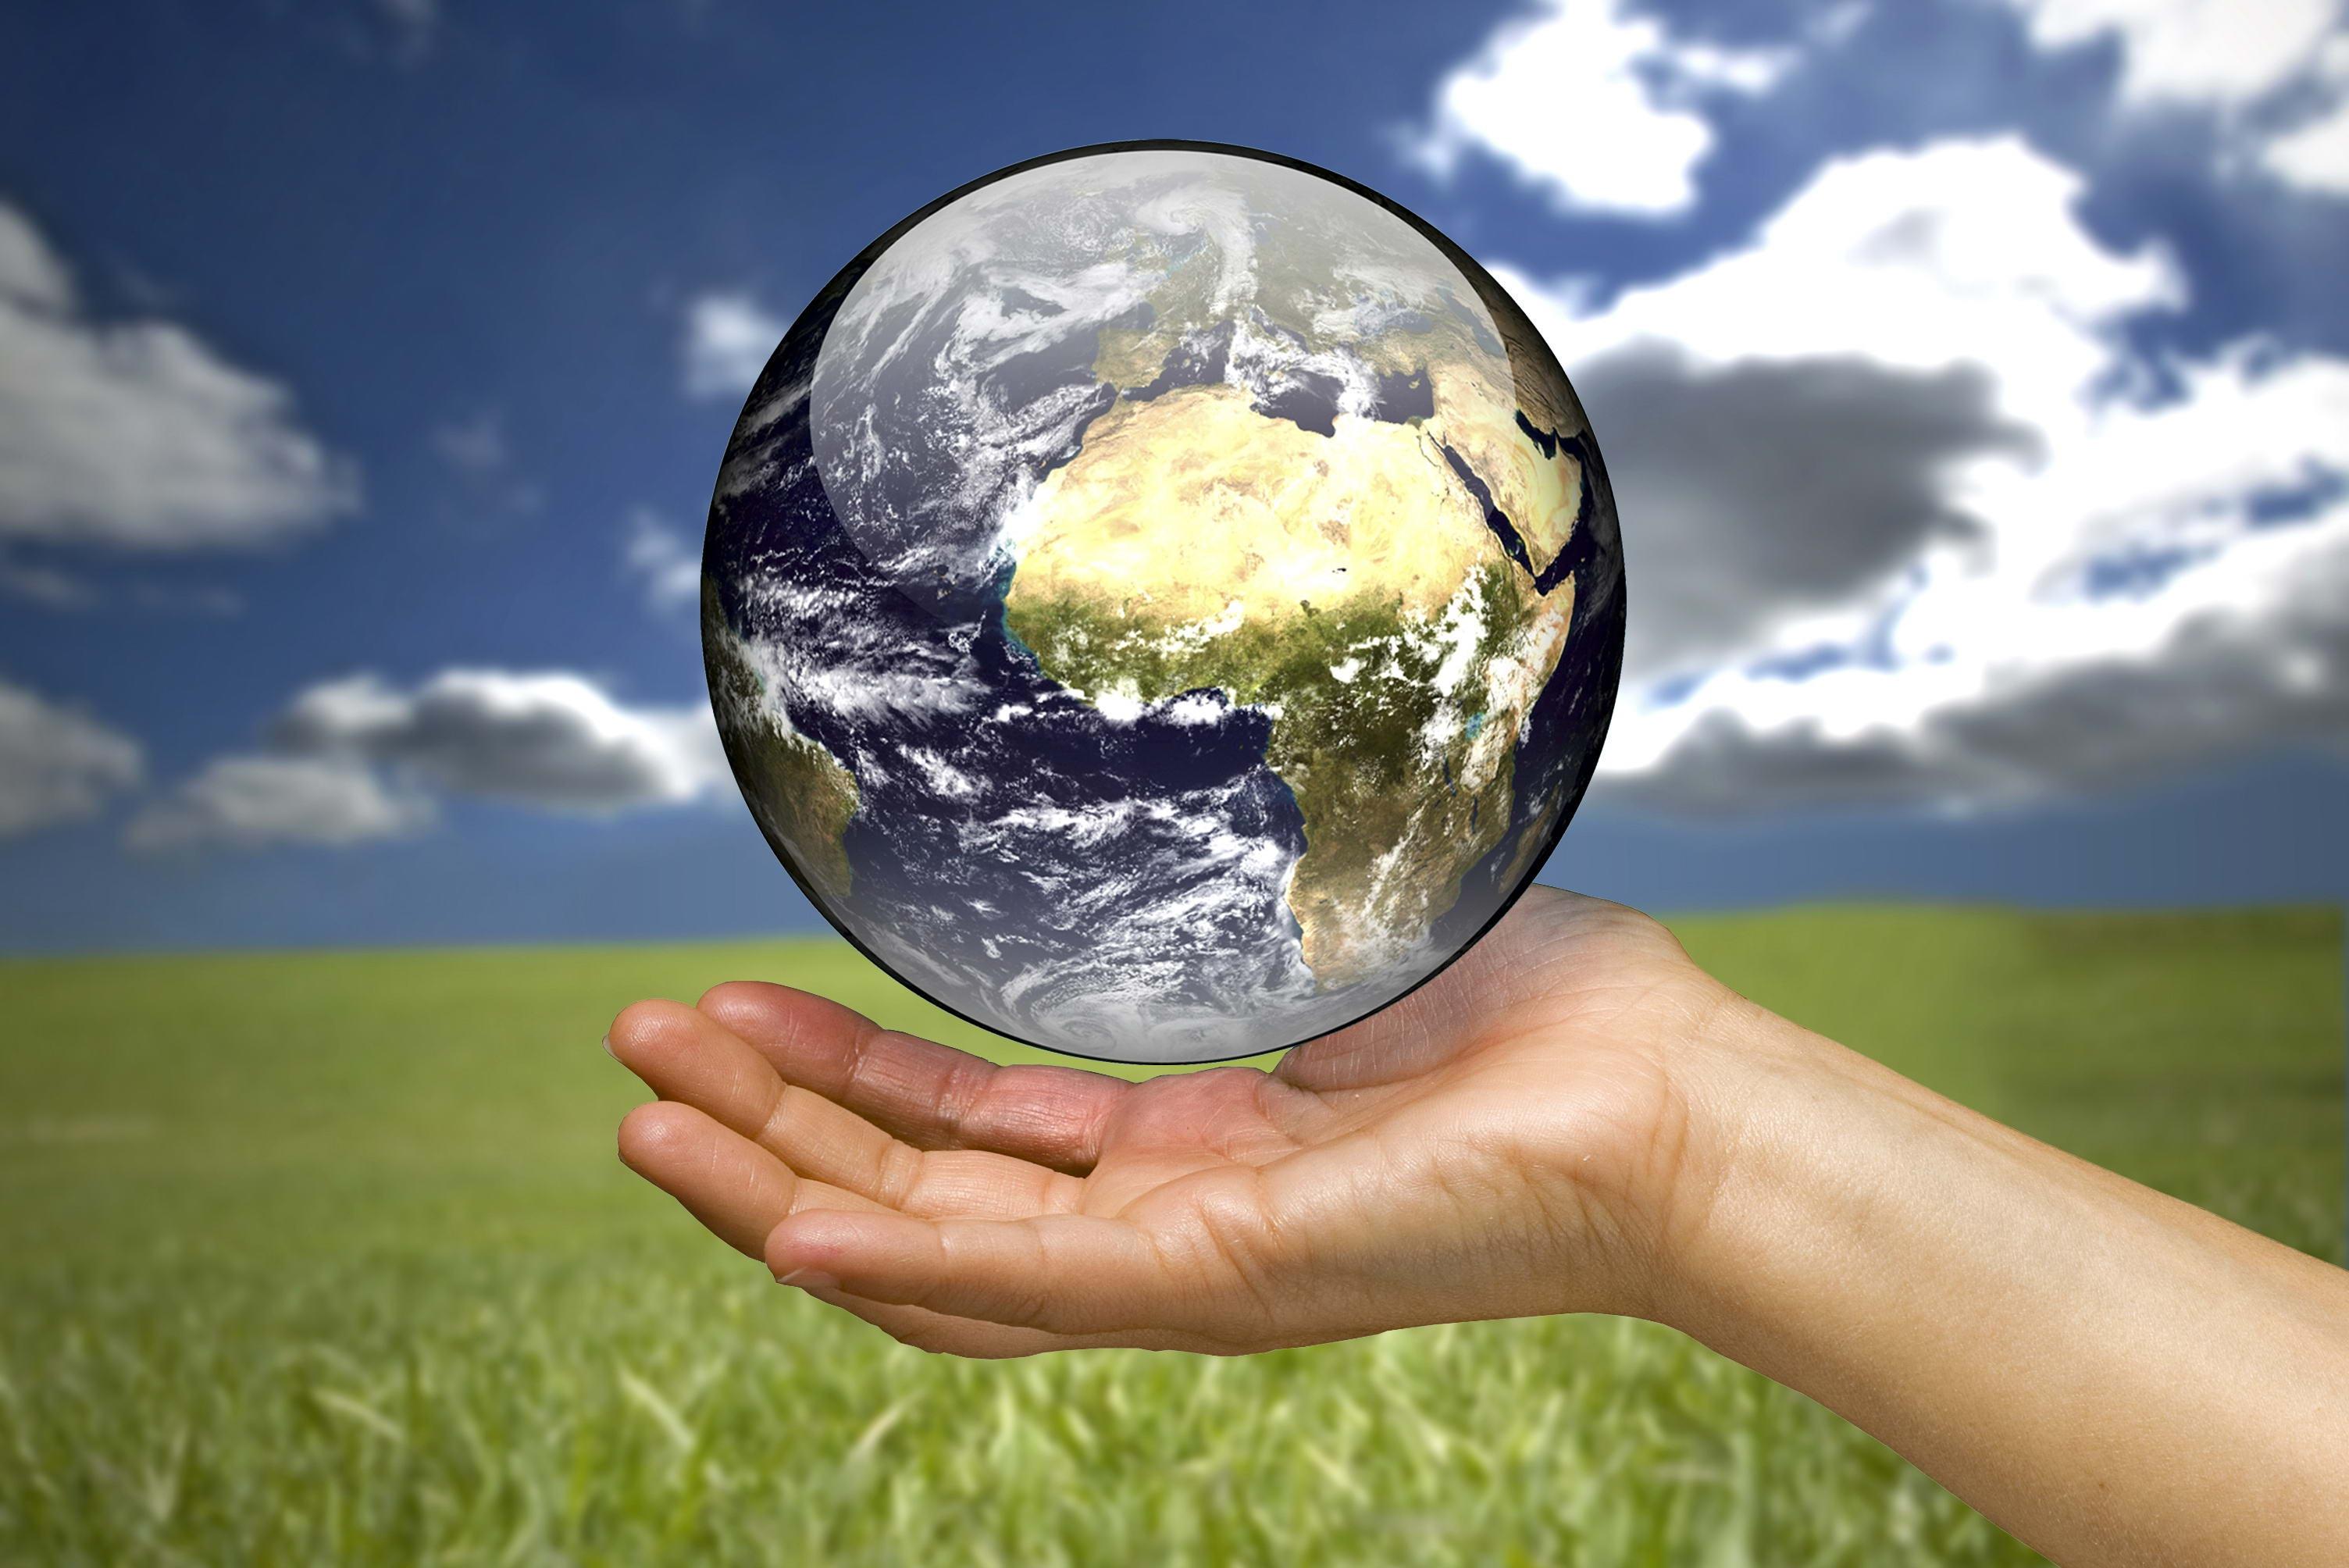 Картинки планета земля в опасности